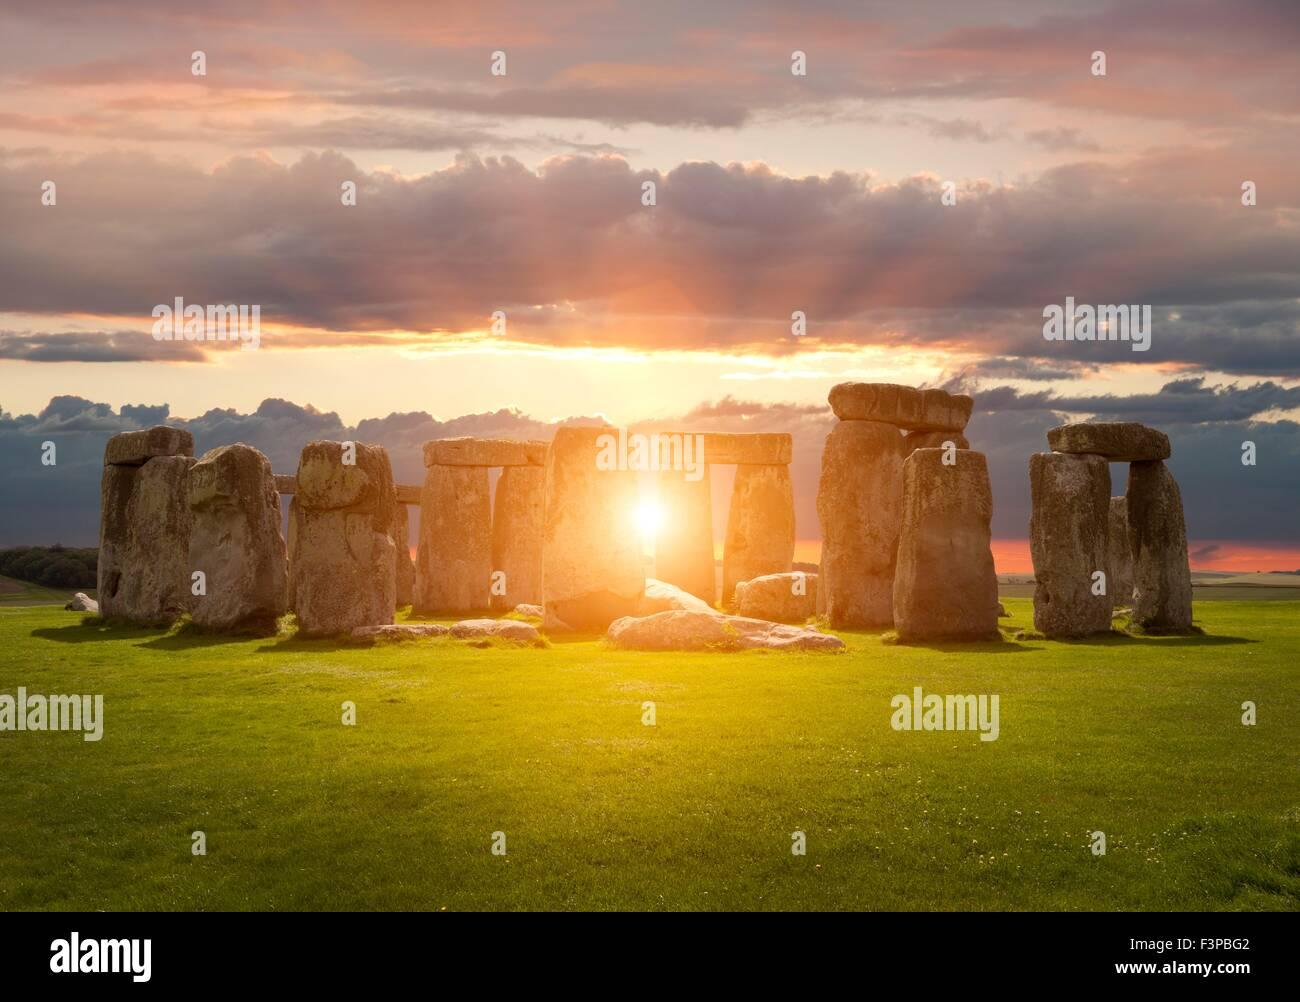 The sun setting over Stonehenge, Wiltshire, England. - Stock Image